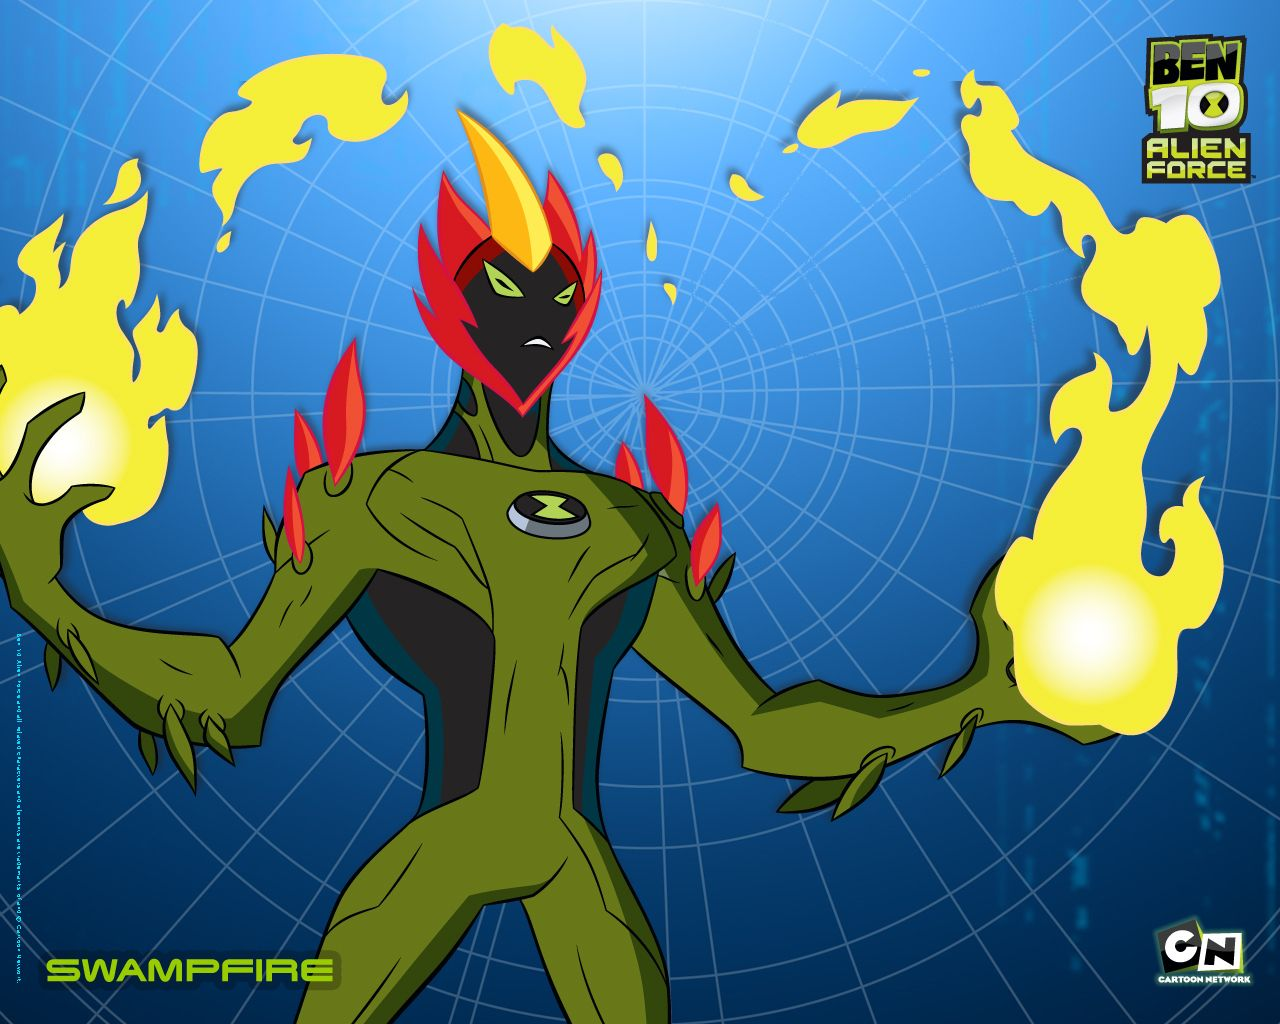 Ben 10 Alien Force Wallpaer Ben 10 Alien Force Ben 10 Cartoon